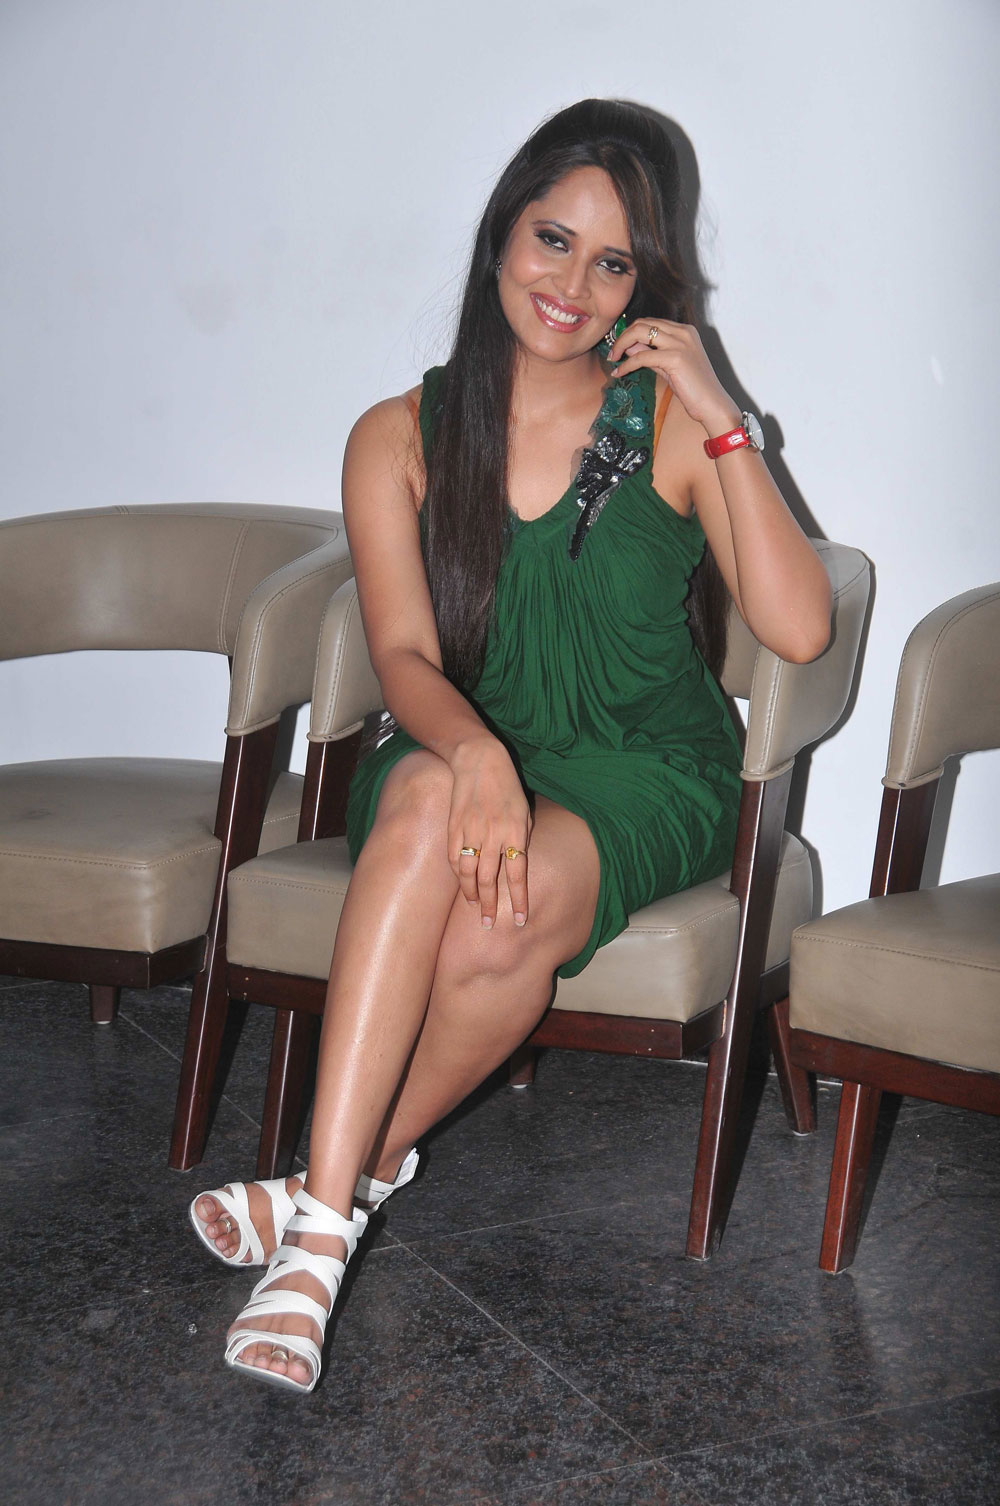 Actor vijay wife photos Aniconism - Wikipedia